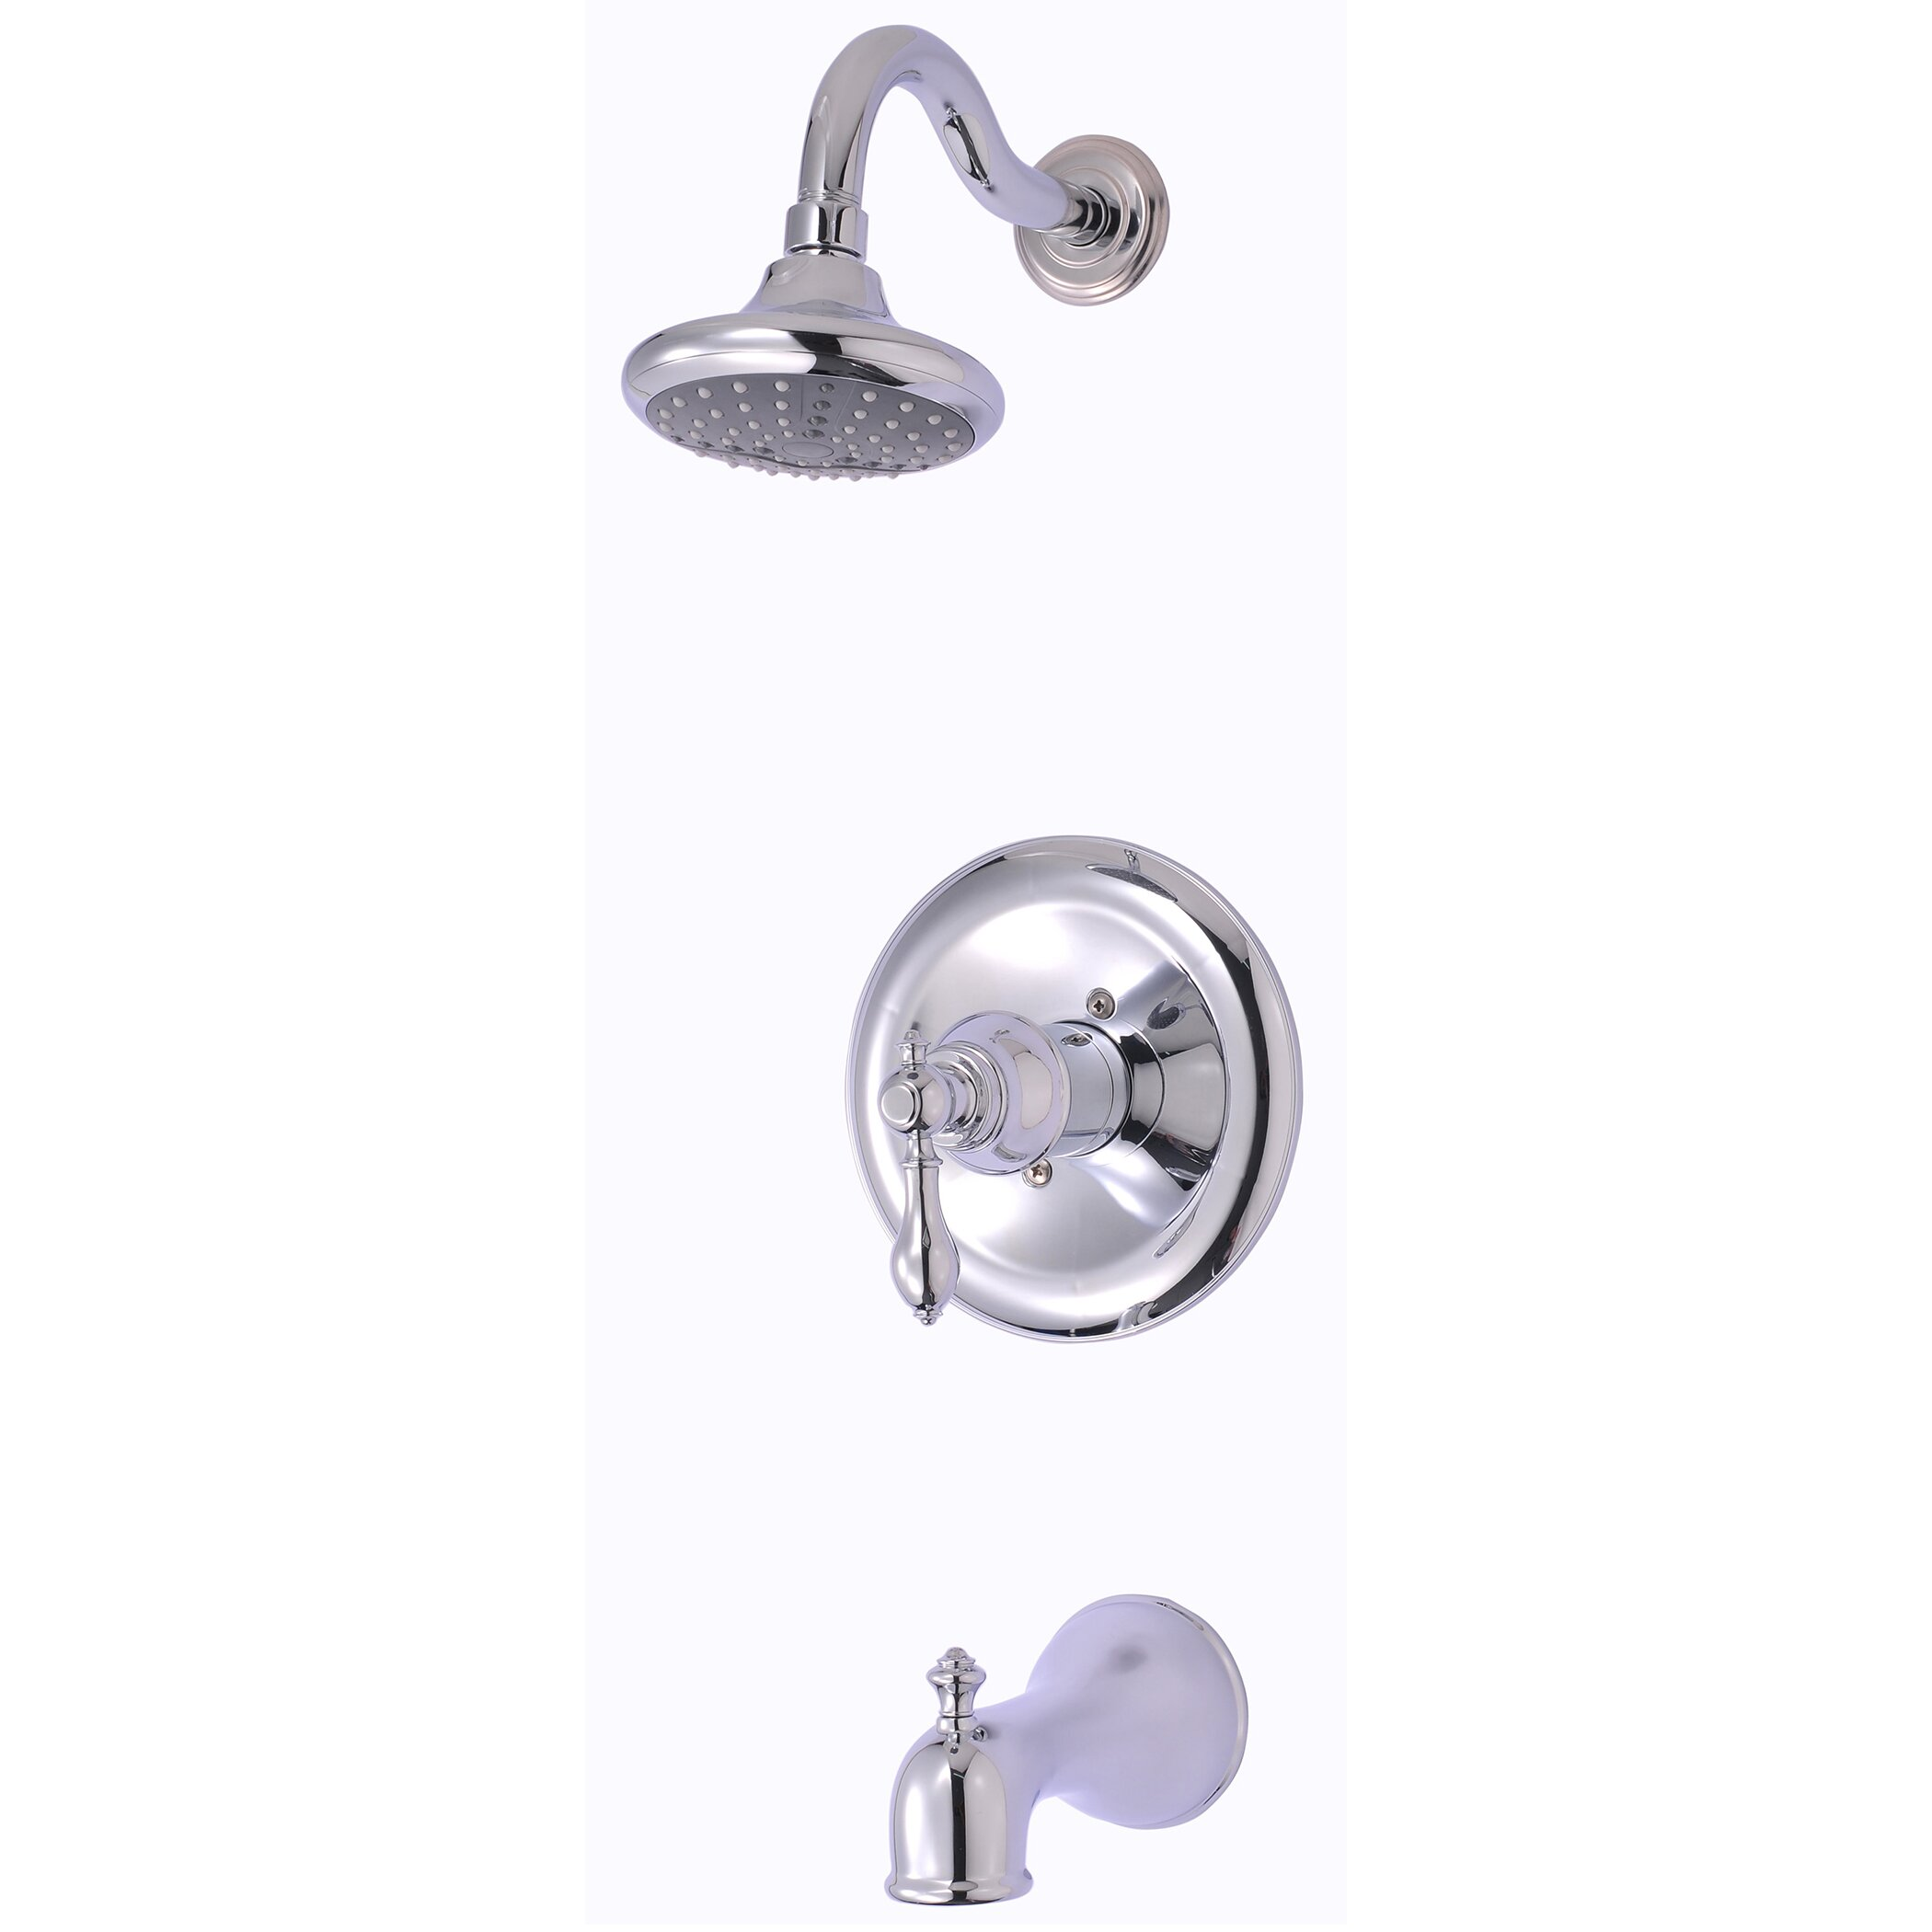 ultra faucets signature pressure balance tub and shower faucet ultra faucets signature pressure balance tub and shower faucet single lever handle